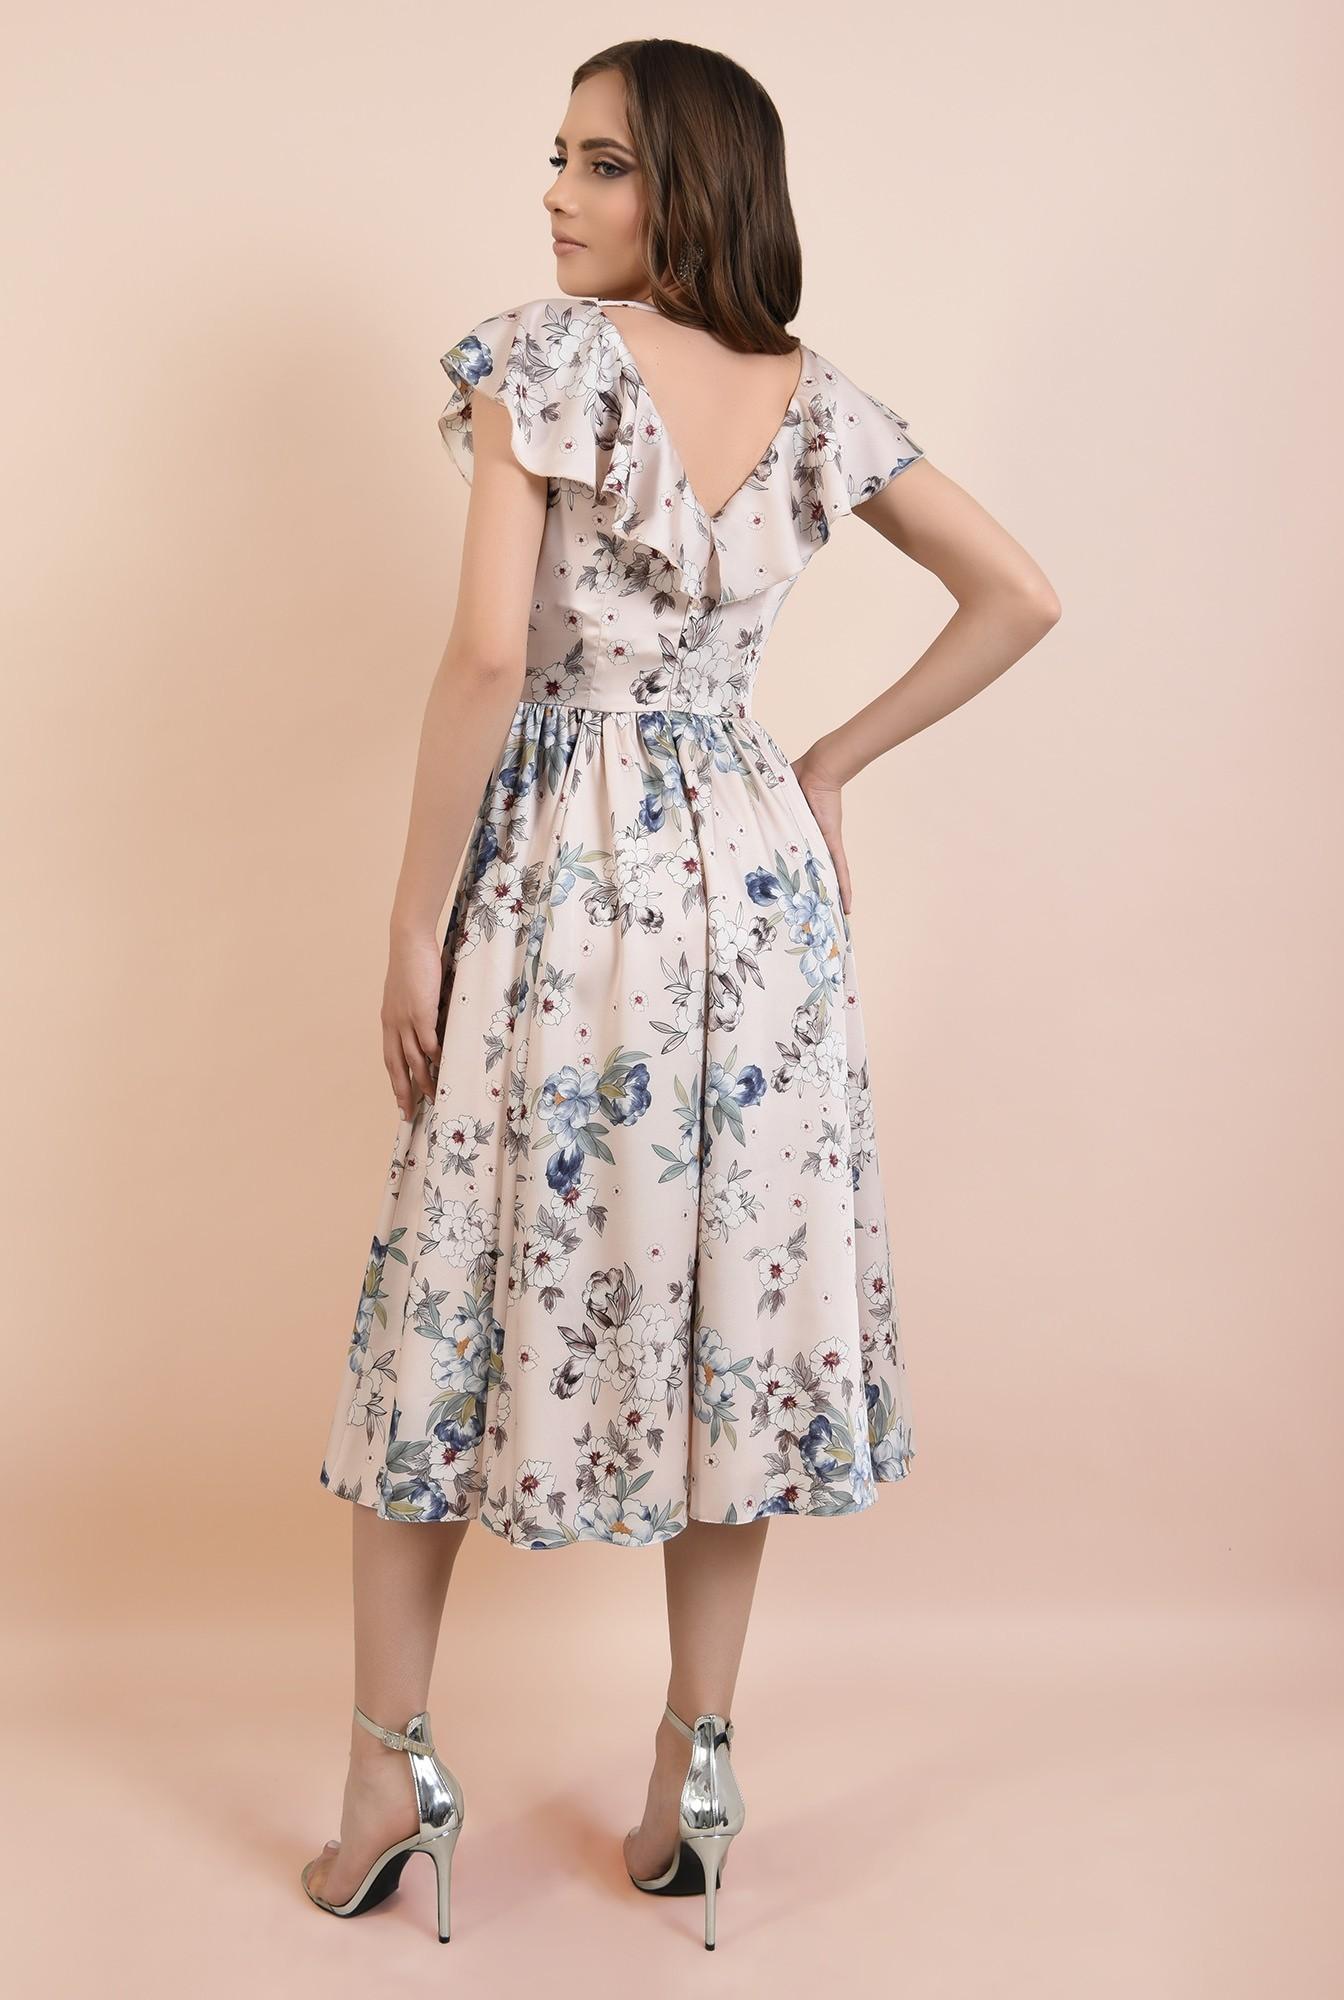 1 - rochie eleganta, evazata, anchior petrecut, maneci volan, imprimata, Poema